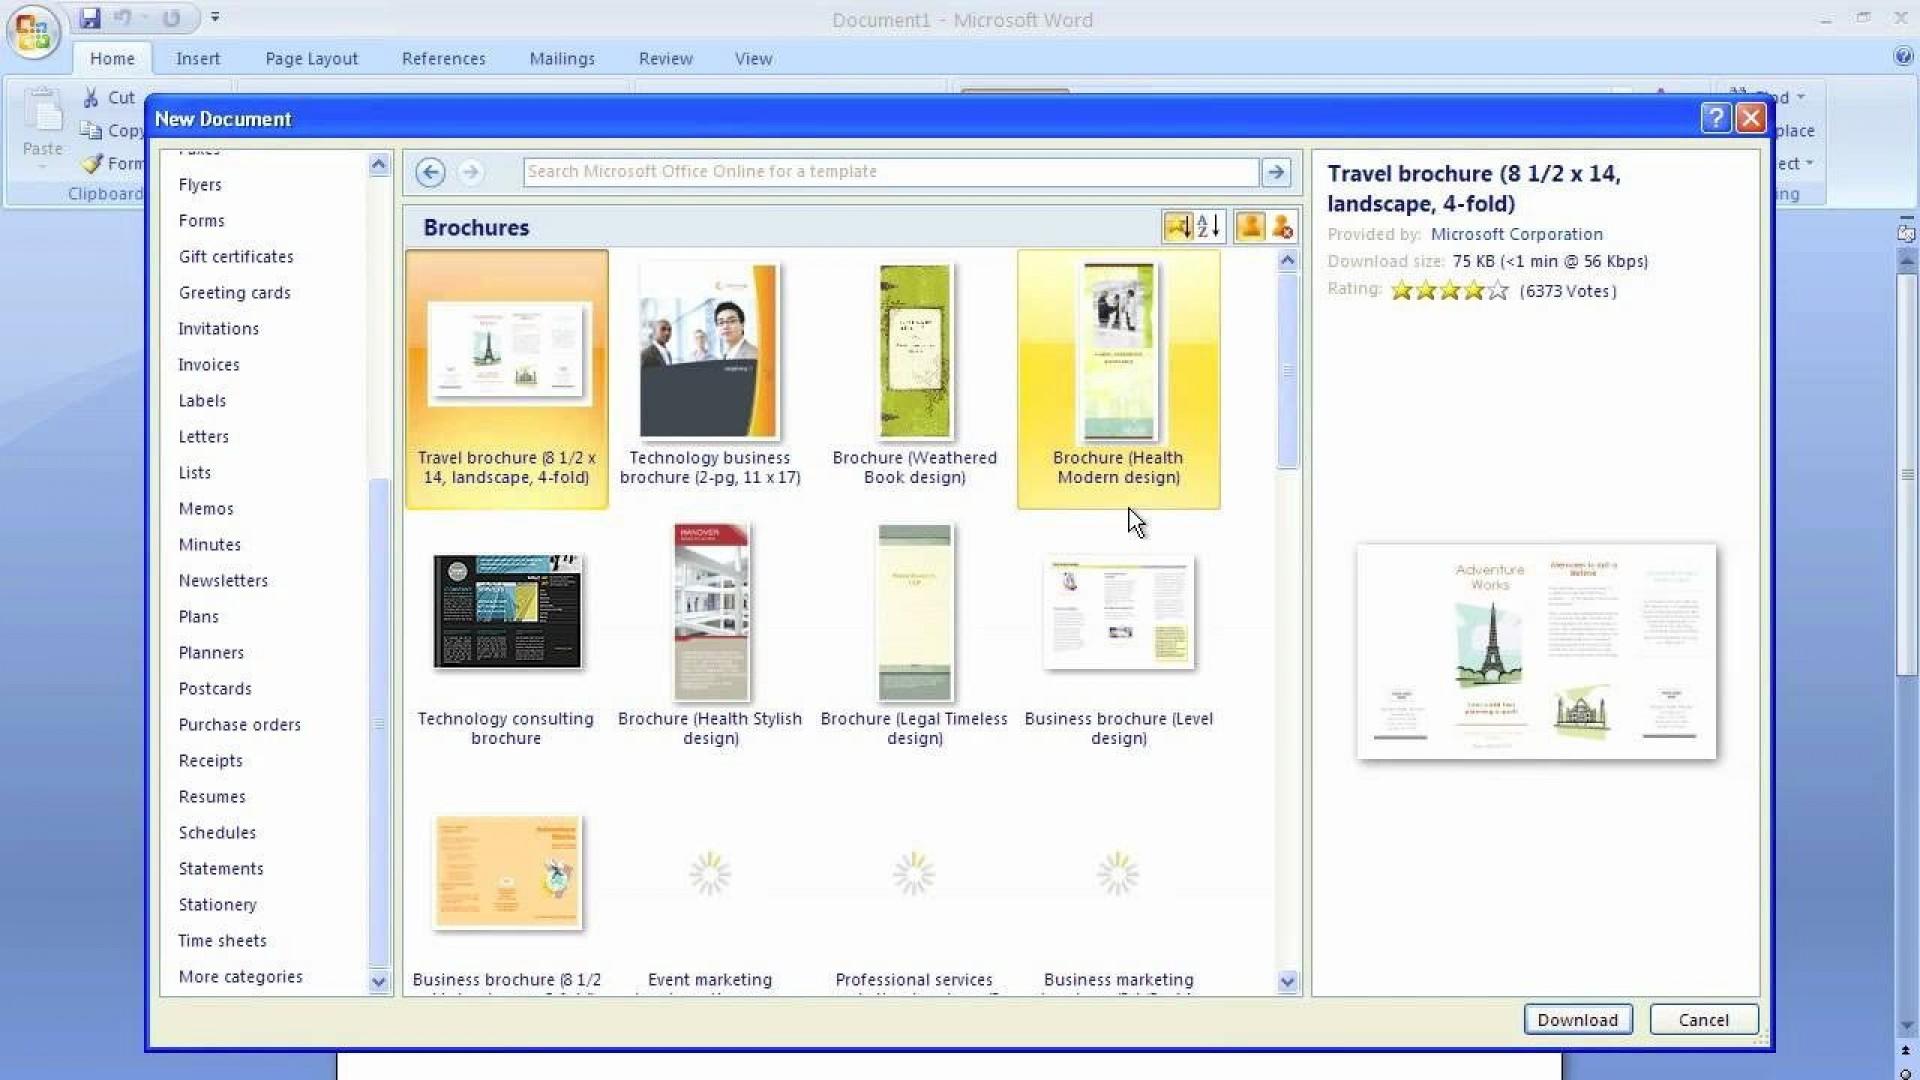 006 Wonderful Microsoft Word Brochure Template High Def  M Free Download Design 2007 A41920